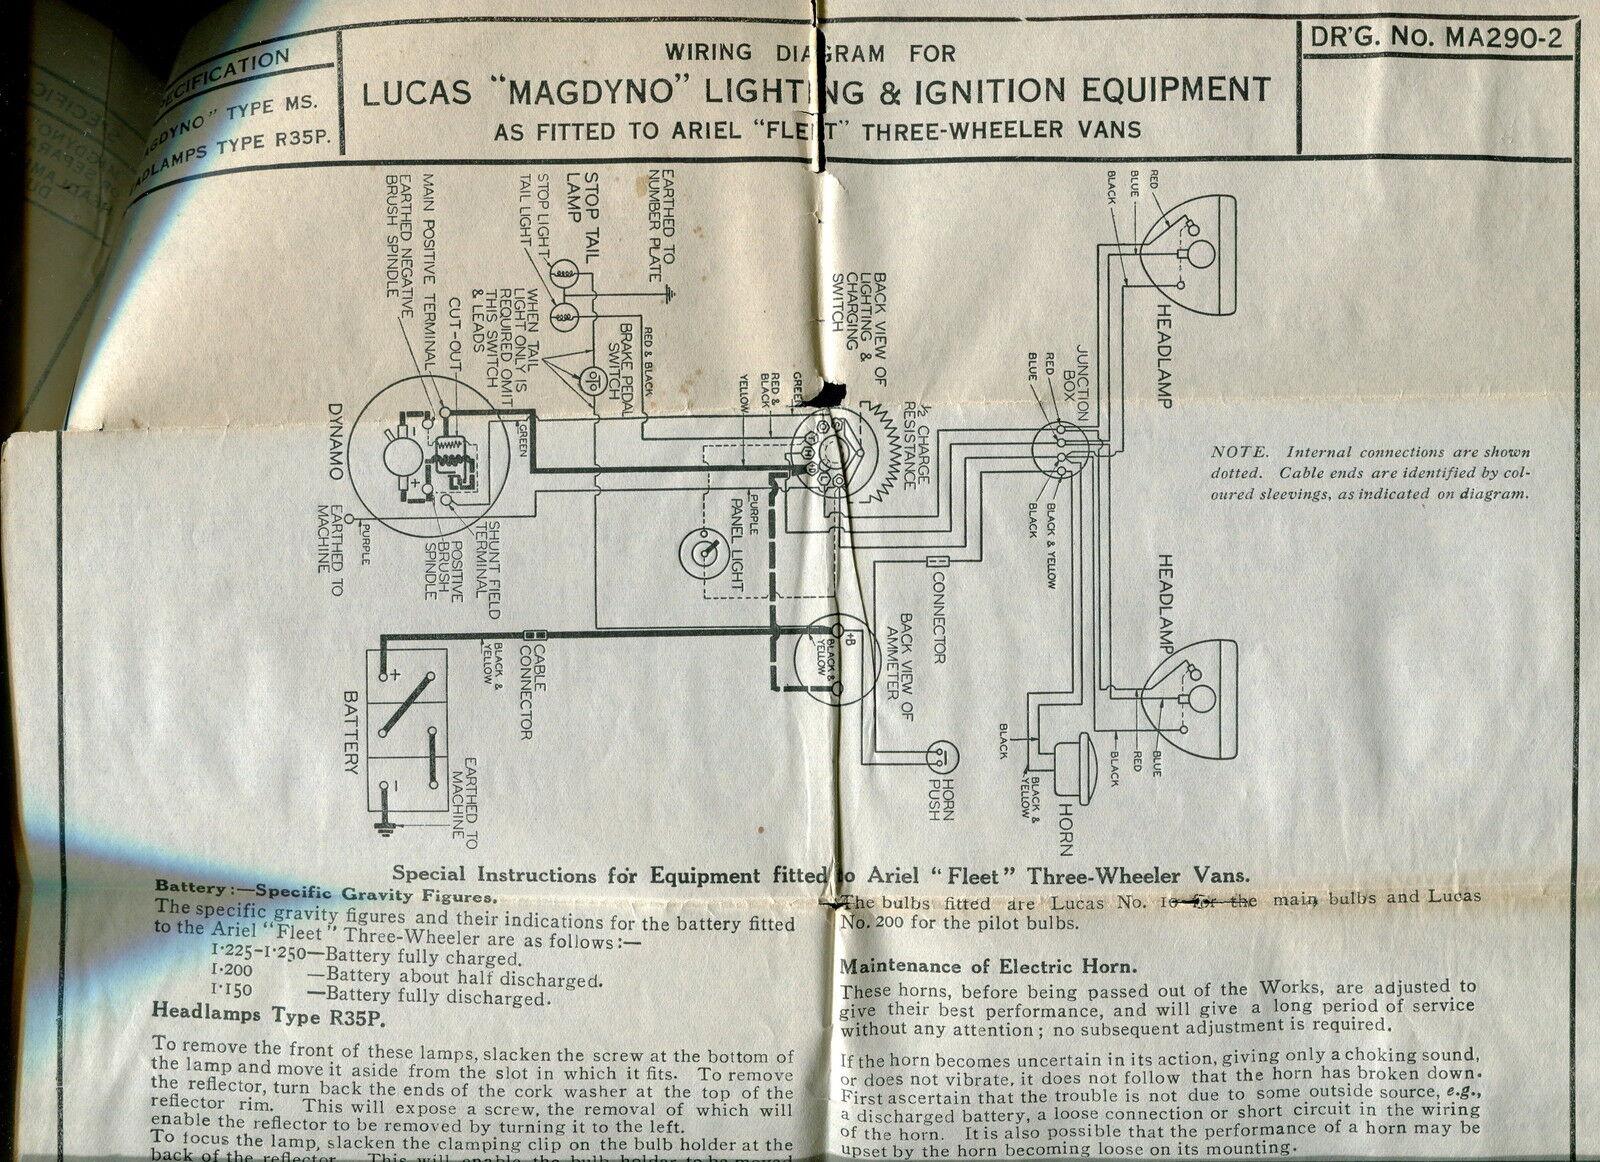 Ariel Motorcycle Wiring Diagram List Of Schematic Circuit Bsa A10 1930s Vintage Lucas Diagrams Rh Picclick Co Uk